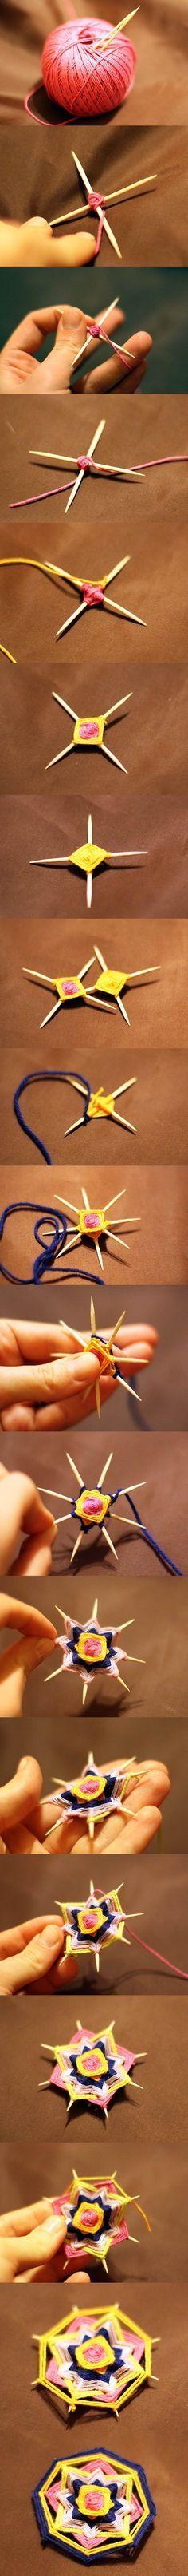 DIY Weave a Mandala Brooch with Toothpicks | iCreativeIdeas.com Like Us on Facebook ==> www.facebook.com/...